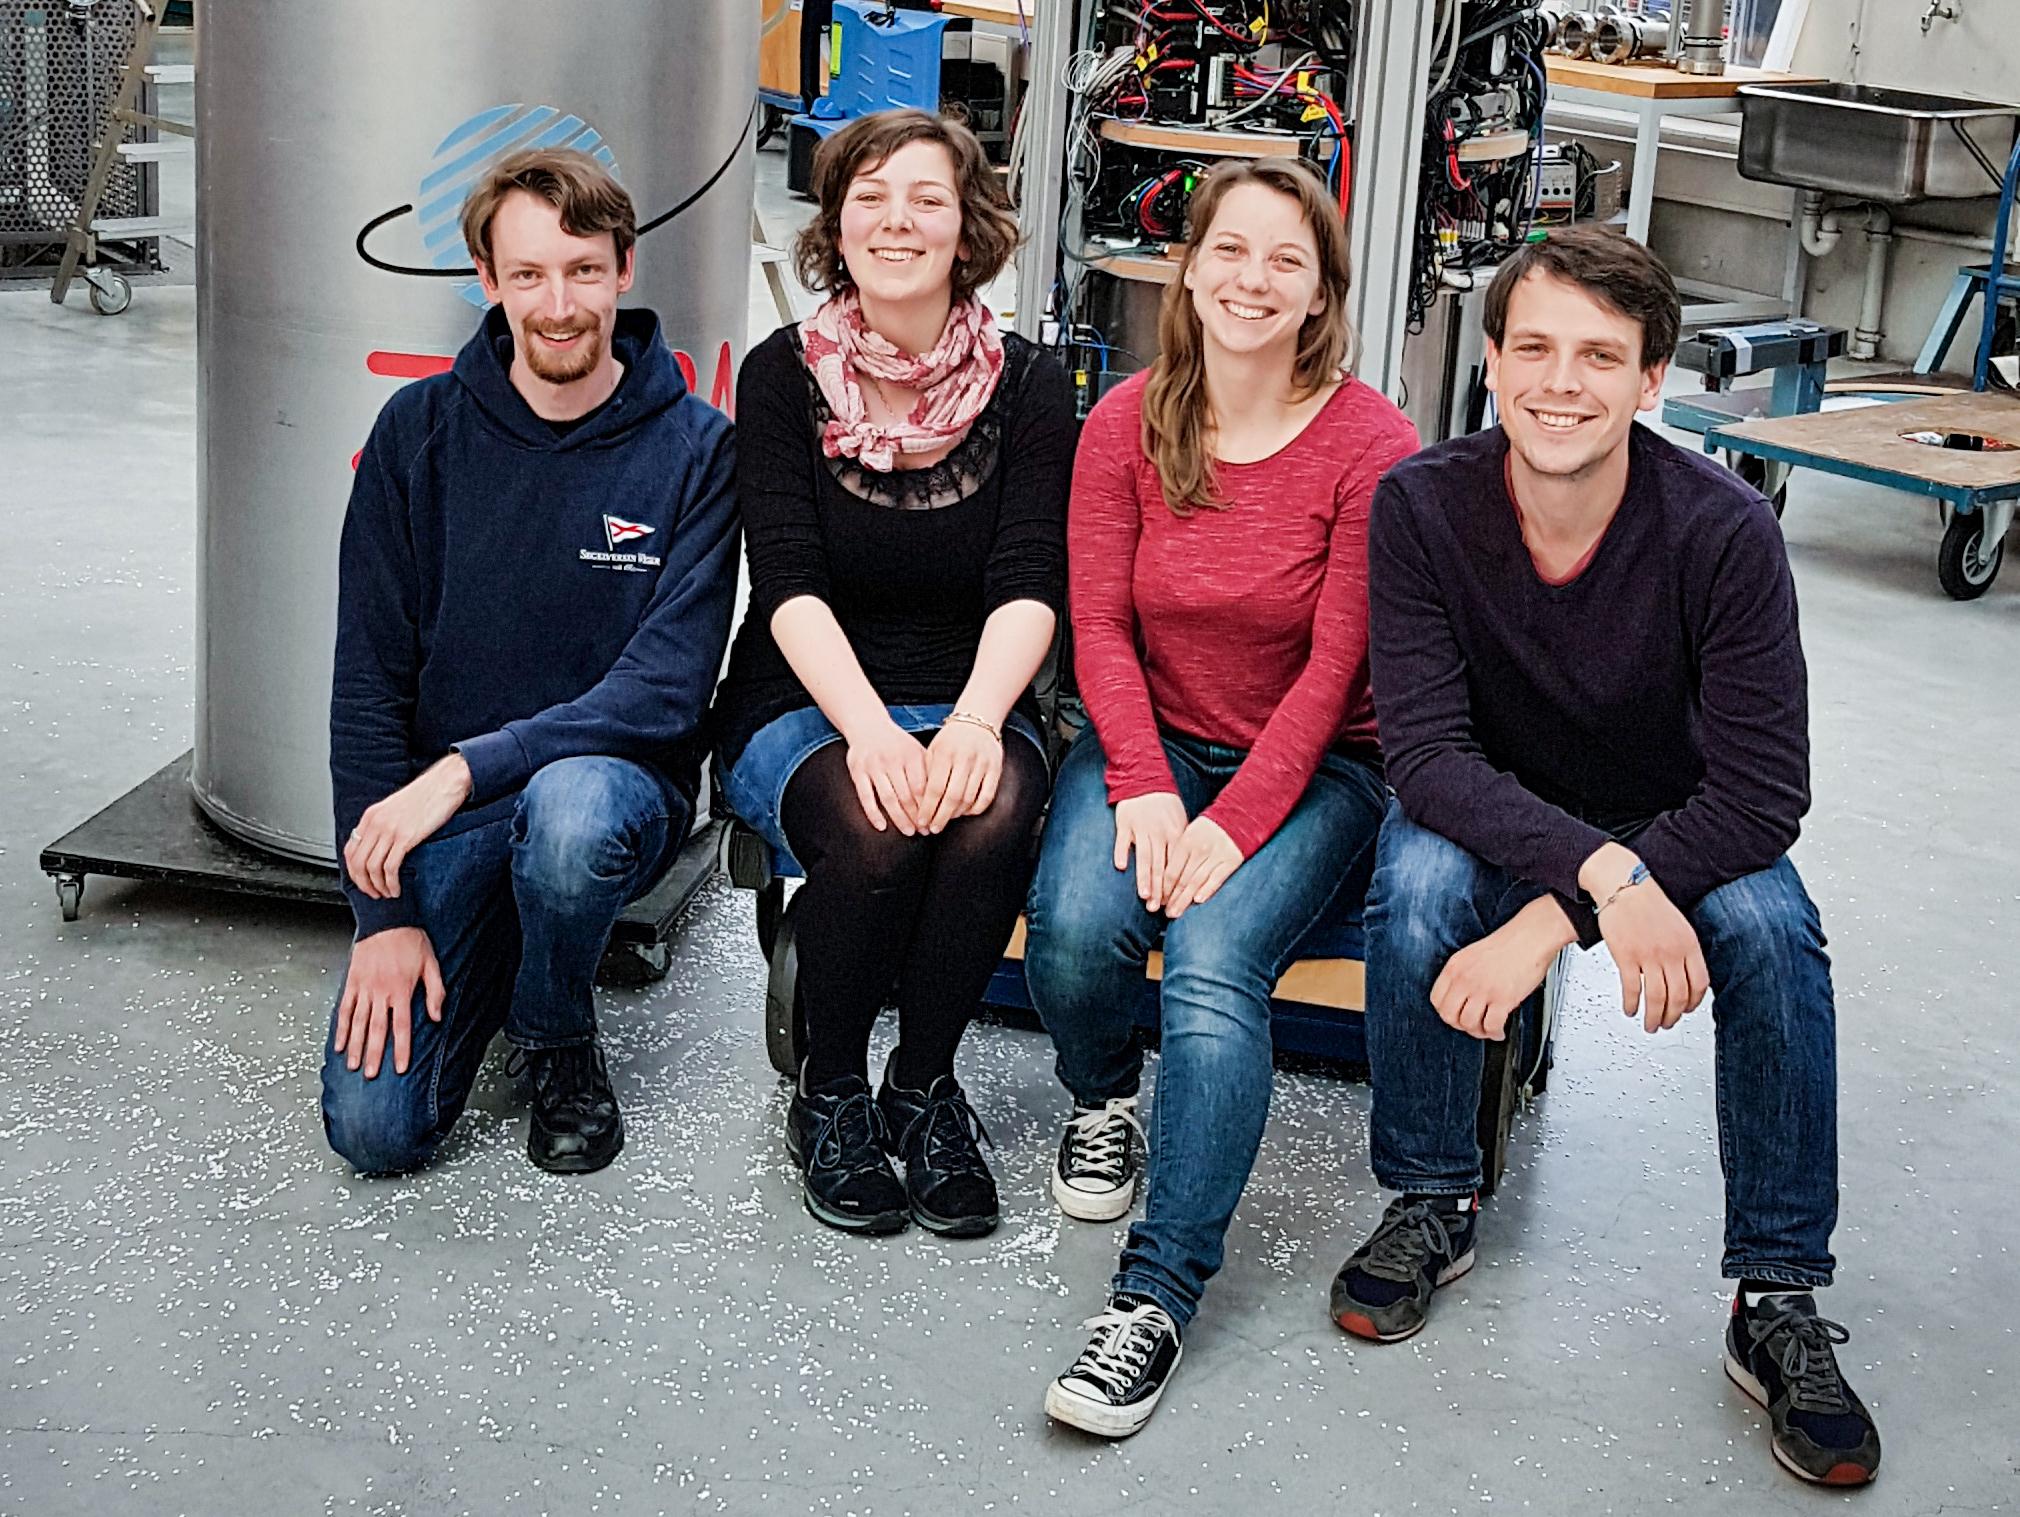 Tým projektu QUANTUS 2 vdobré náladě. Kredit: Universität Bremen.